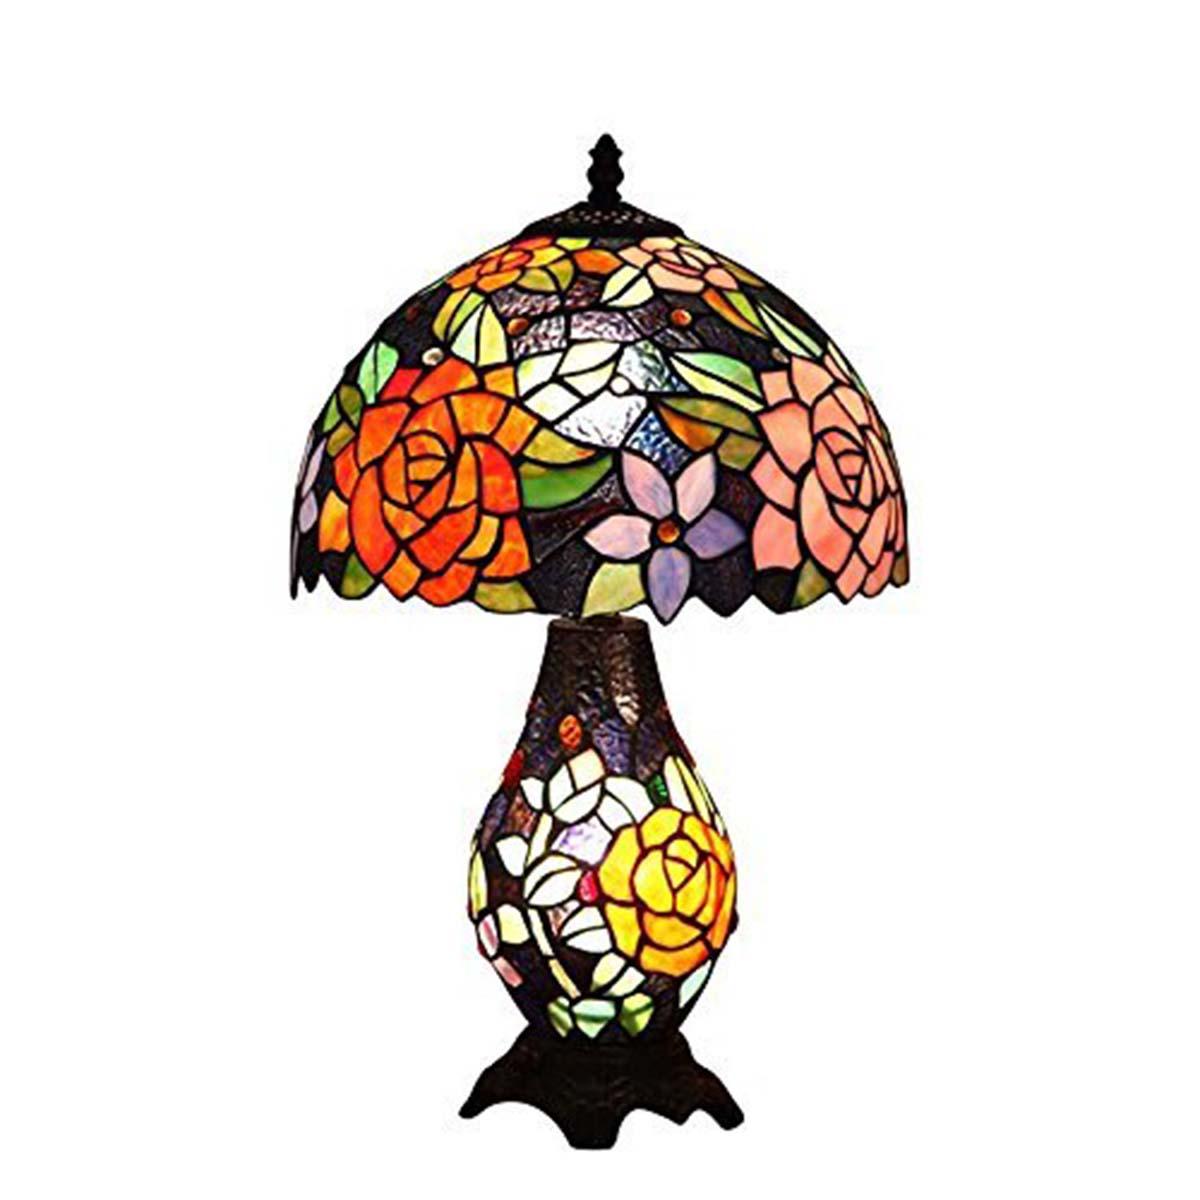 Bieye照明 ティファニーランプ 薔薇 バラ ベッドサイド ステンドグラスランプ インテリアライト 贈り物 雰囲気ランプ 卓上照明 オシャレ ロマンチック ステンドグラス照明 ステンドグラス ベッドサイドランプ 癒しグッズ 間接照明